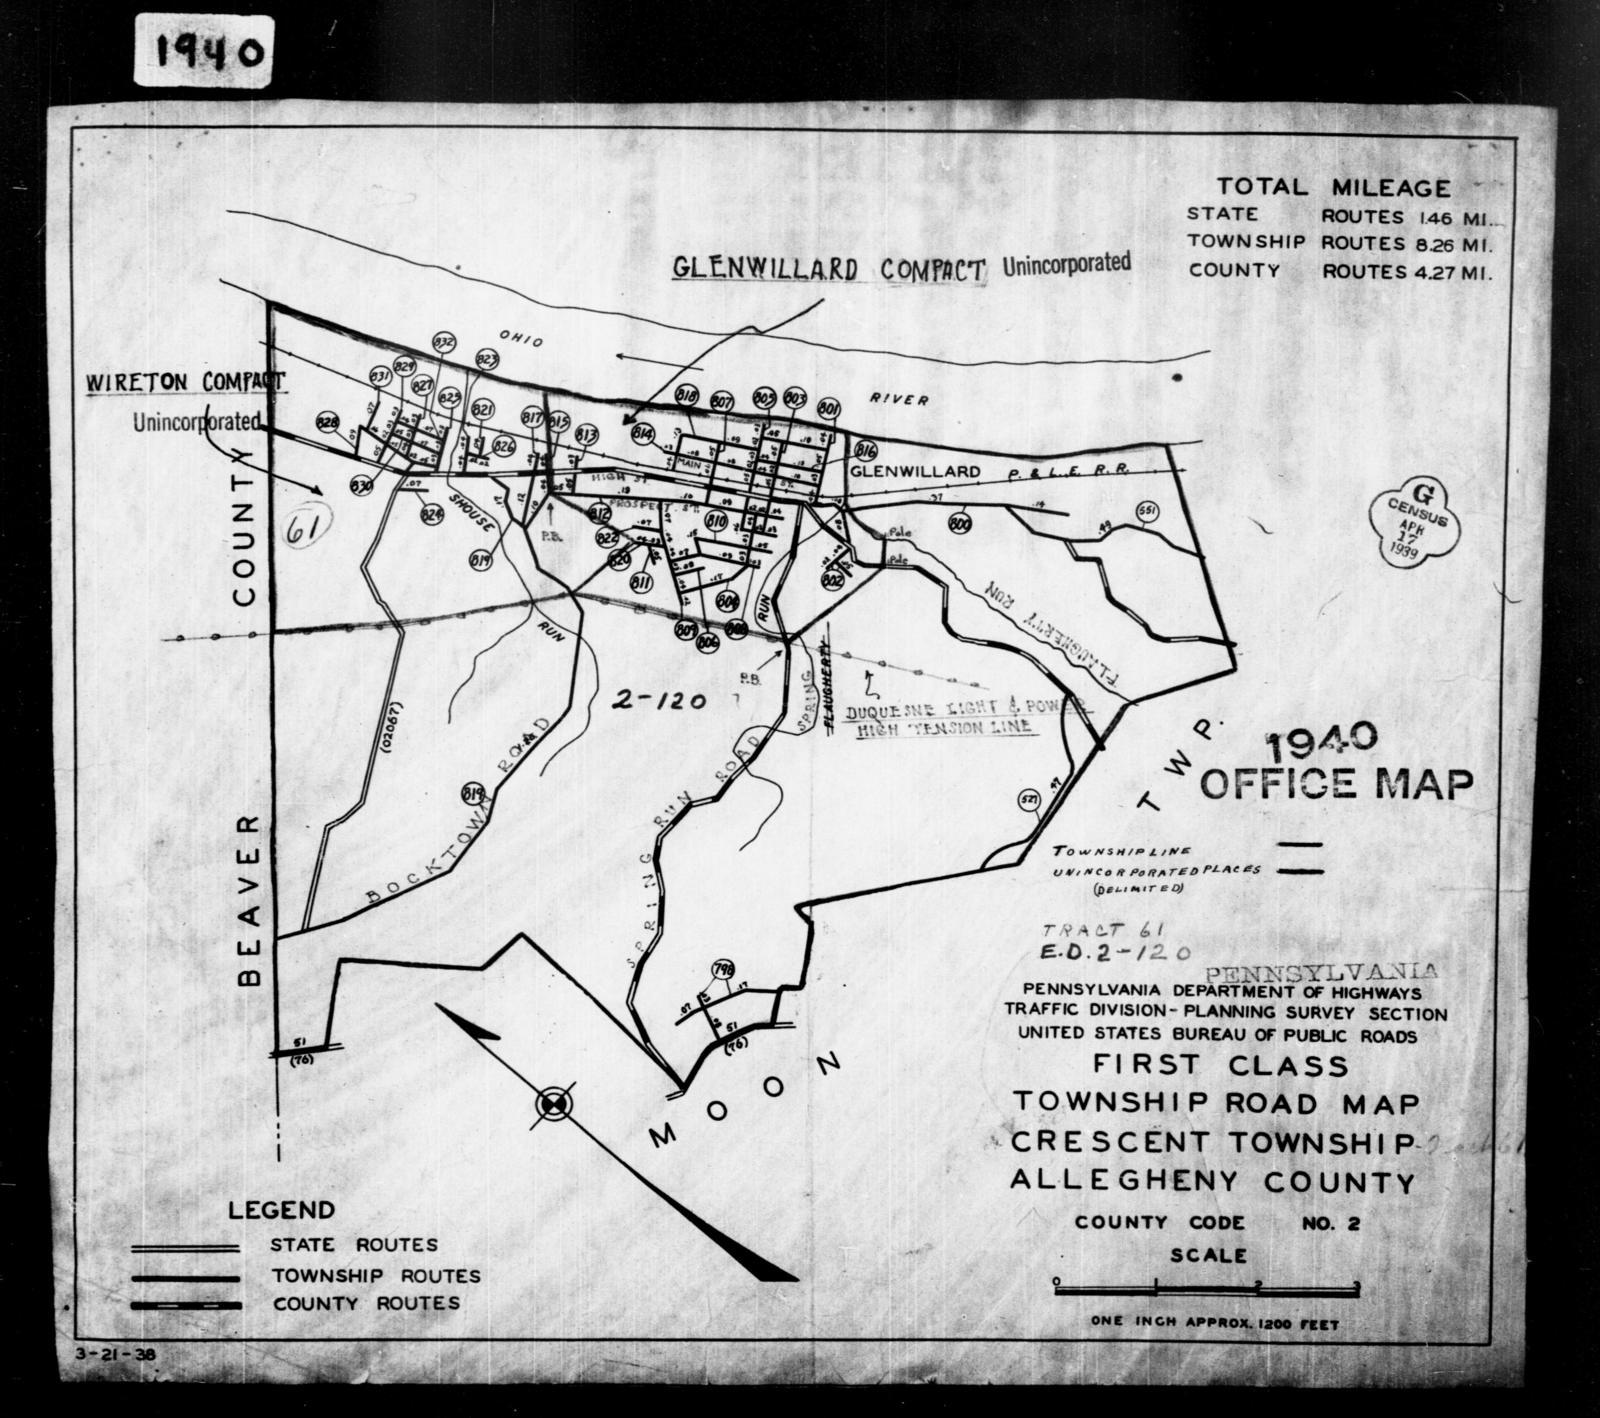 1940 Census Enumeration District Maps - Pennsylvania - Allegheny County - Crescent - ED 2-120